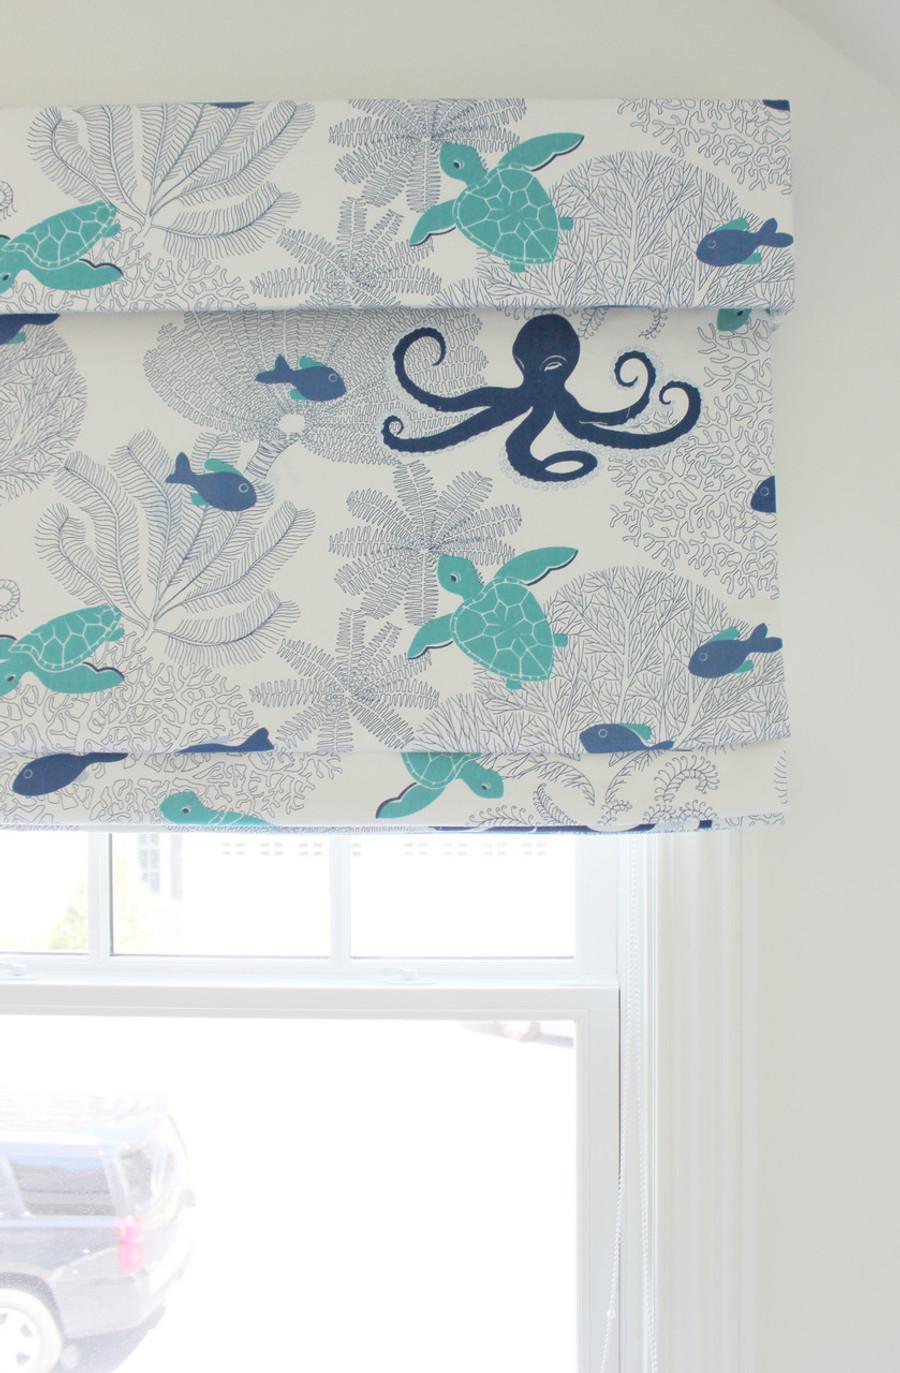 21016-605 Sea Life Duralee Fabric Roman Shade with Valance Boys Room (Toni Gallagher Interiors)